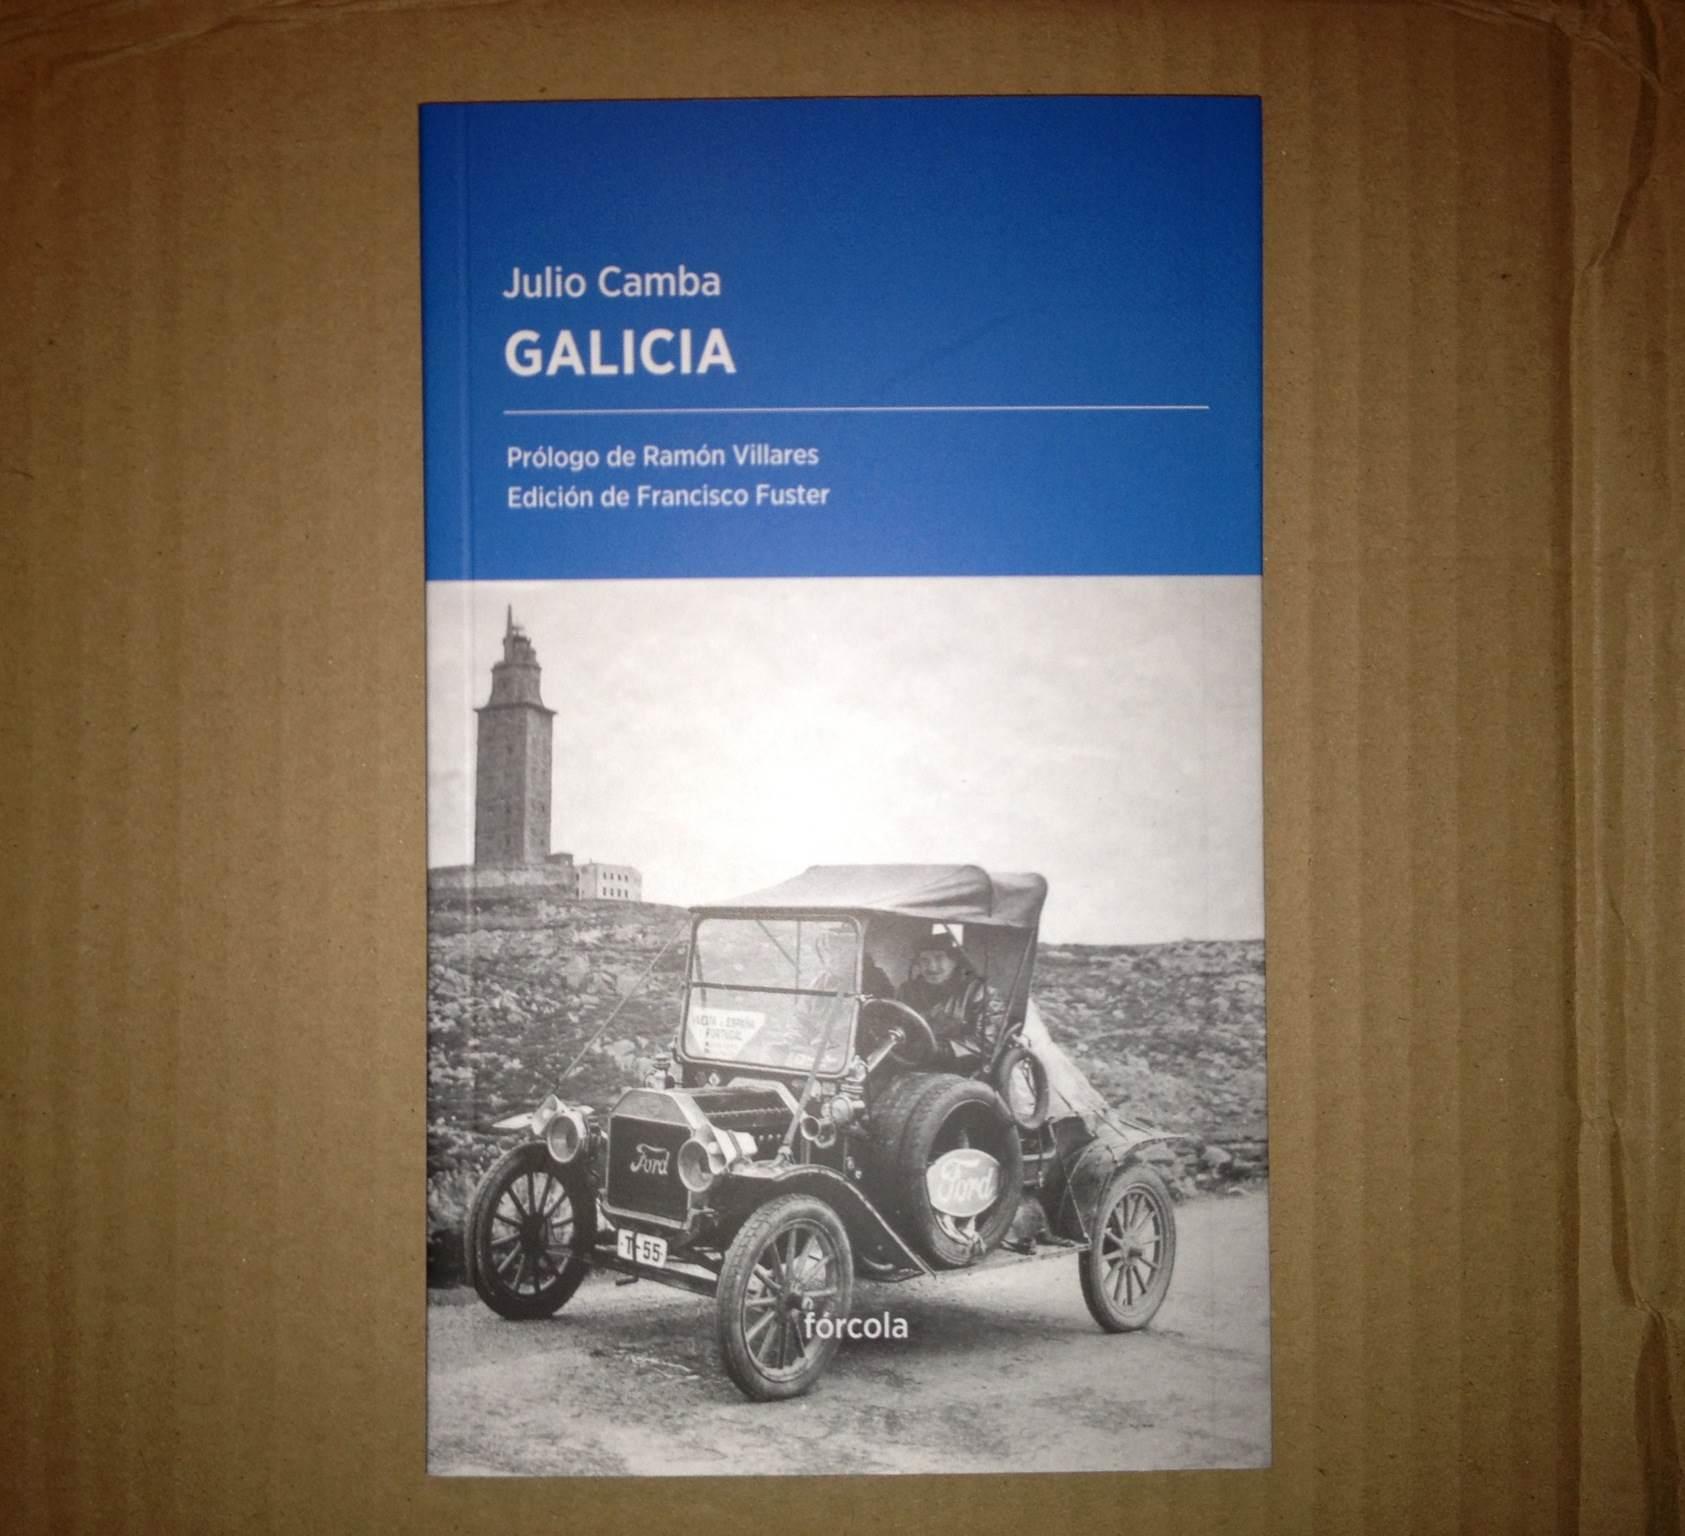 Galicia, Julio Camba (Fórcola, 2015)